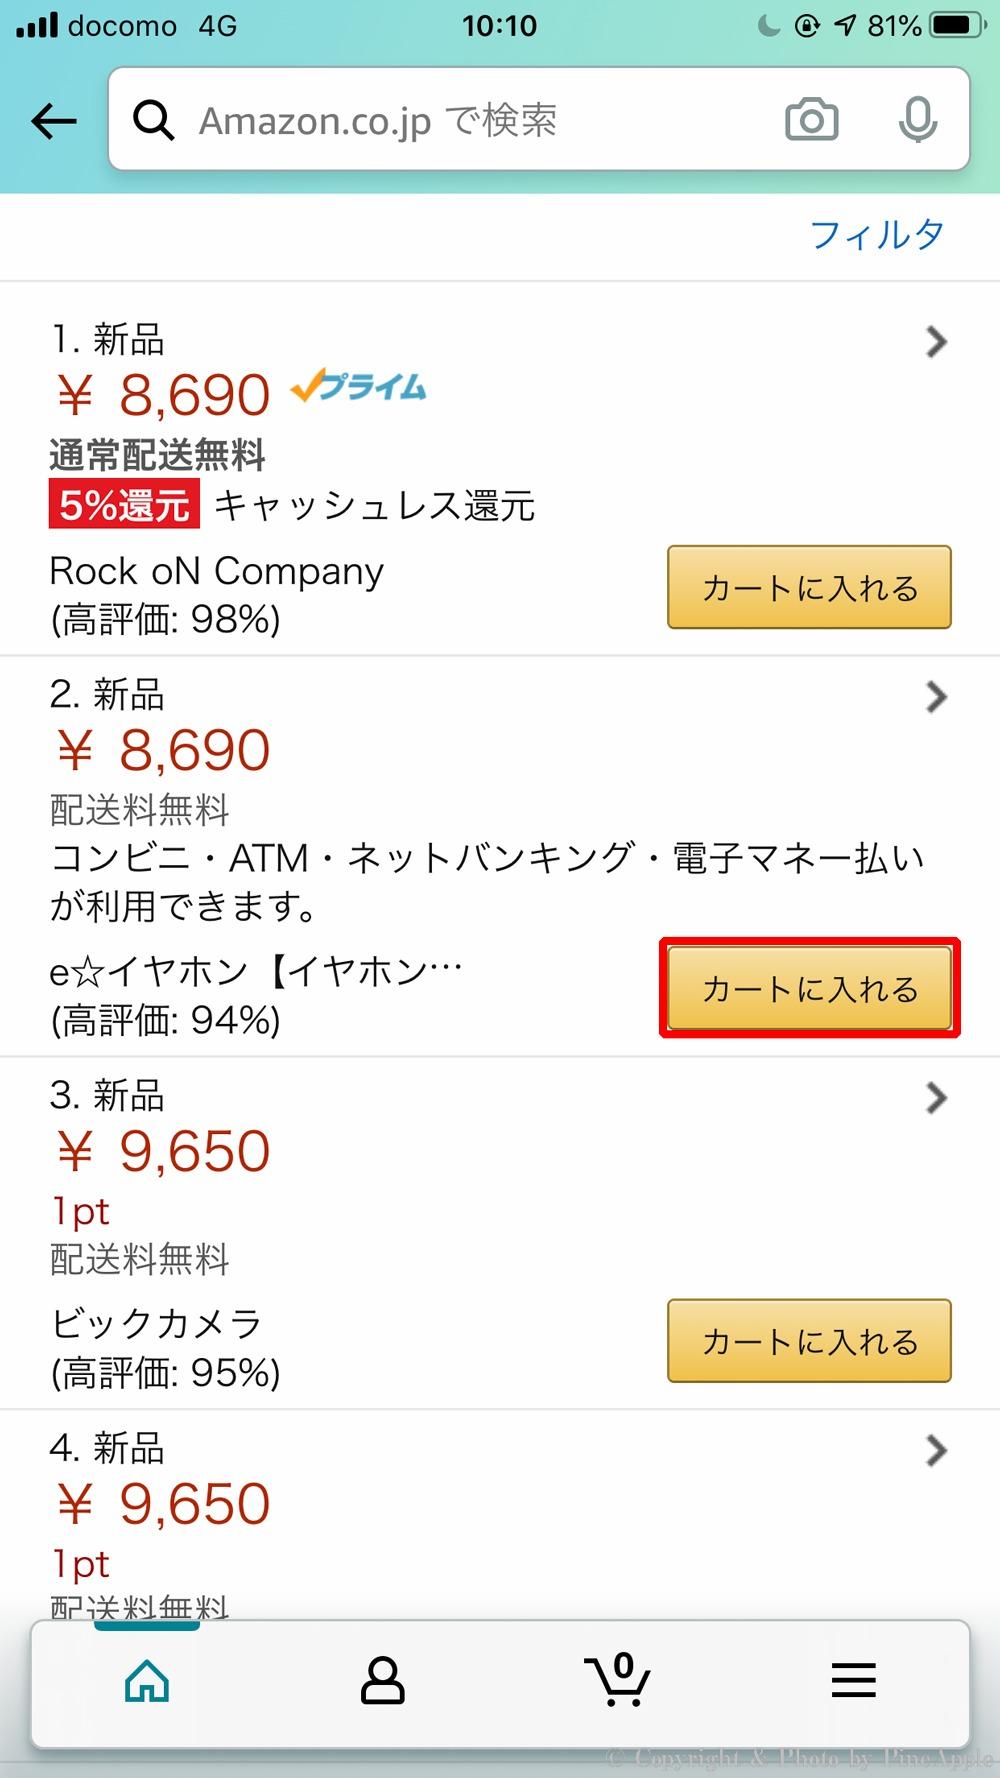 Amazon ショッピングアプリ:購入店舗の「カートに入れる」をタップ